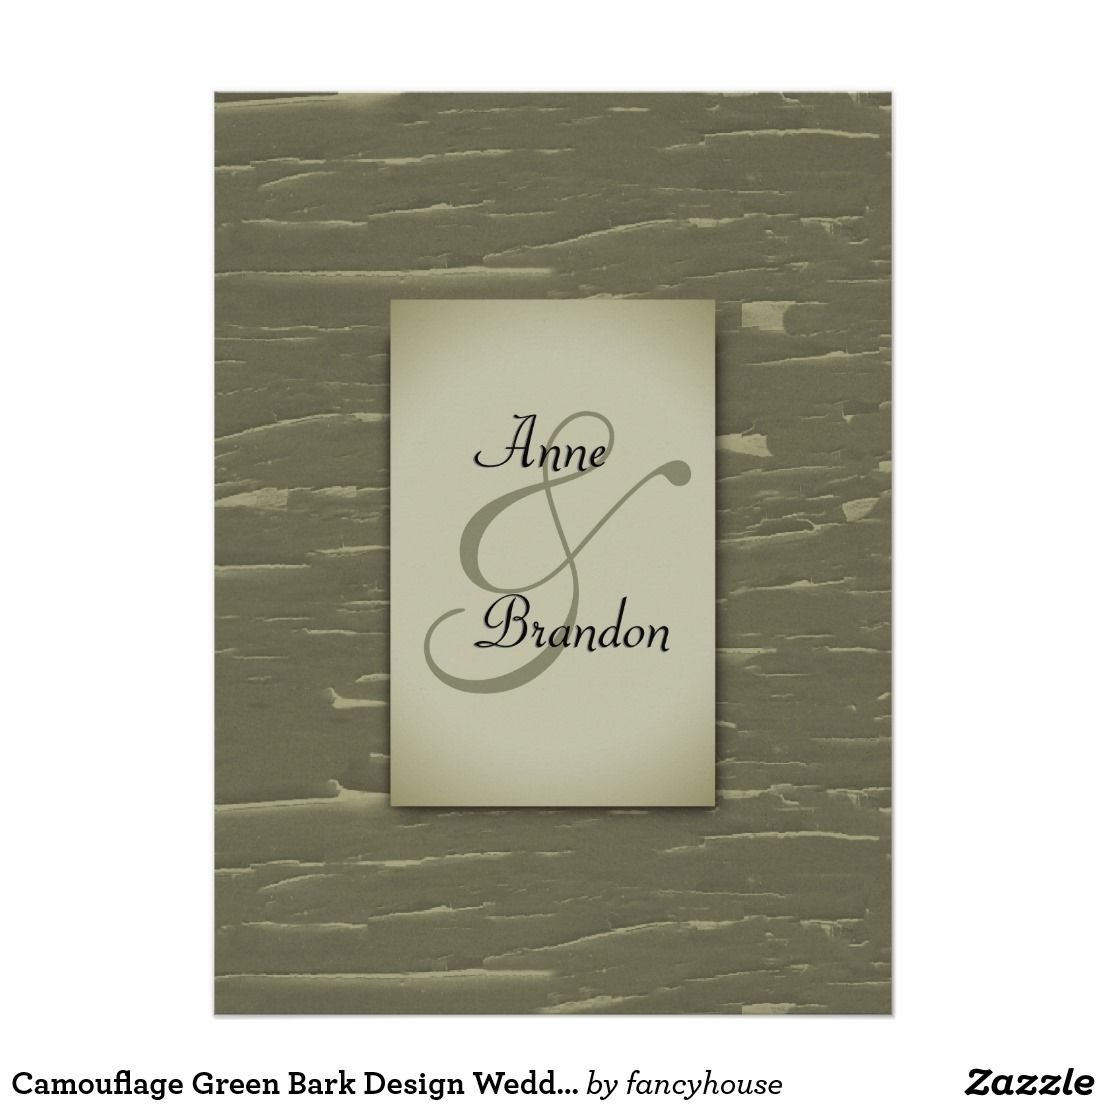 Camouflage Green Bark Design Wedding Invitation Green Weddings